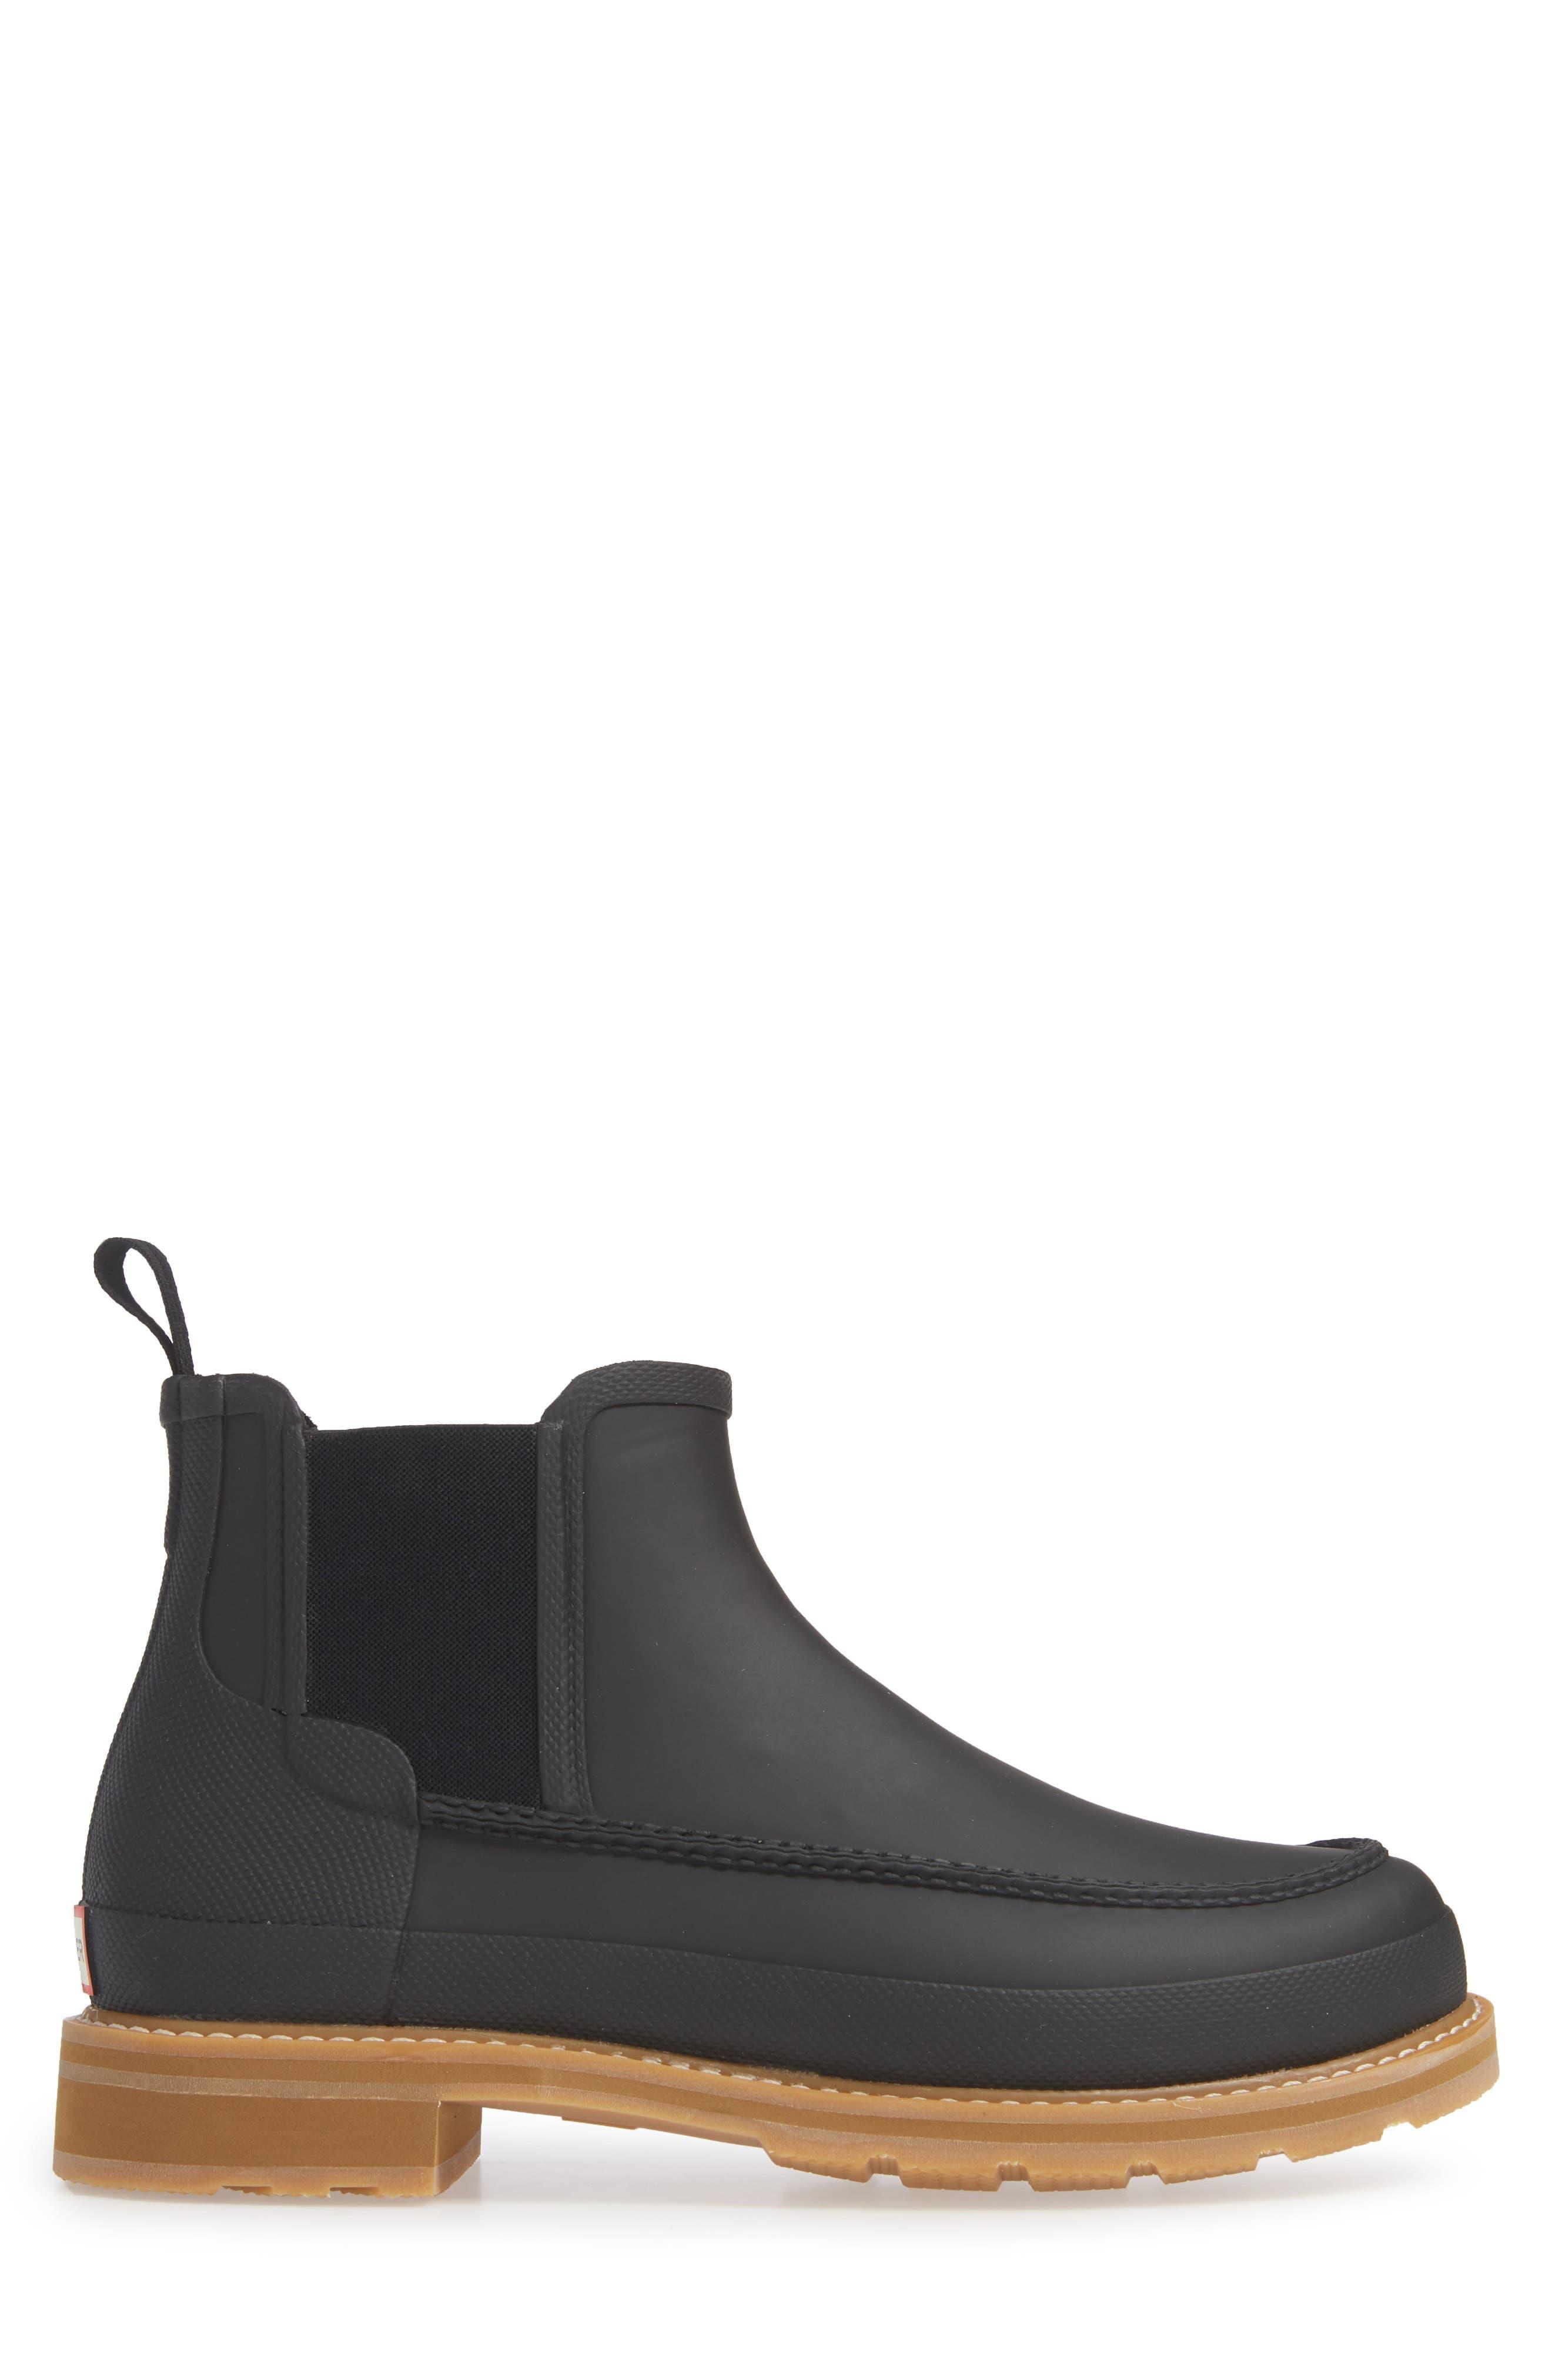 HUNTER,                             Moc Toe Waterproof Chelsea Boot,                             Alternate thumbnail 3, color,                             BLACK